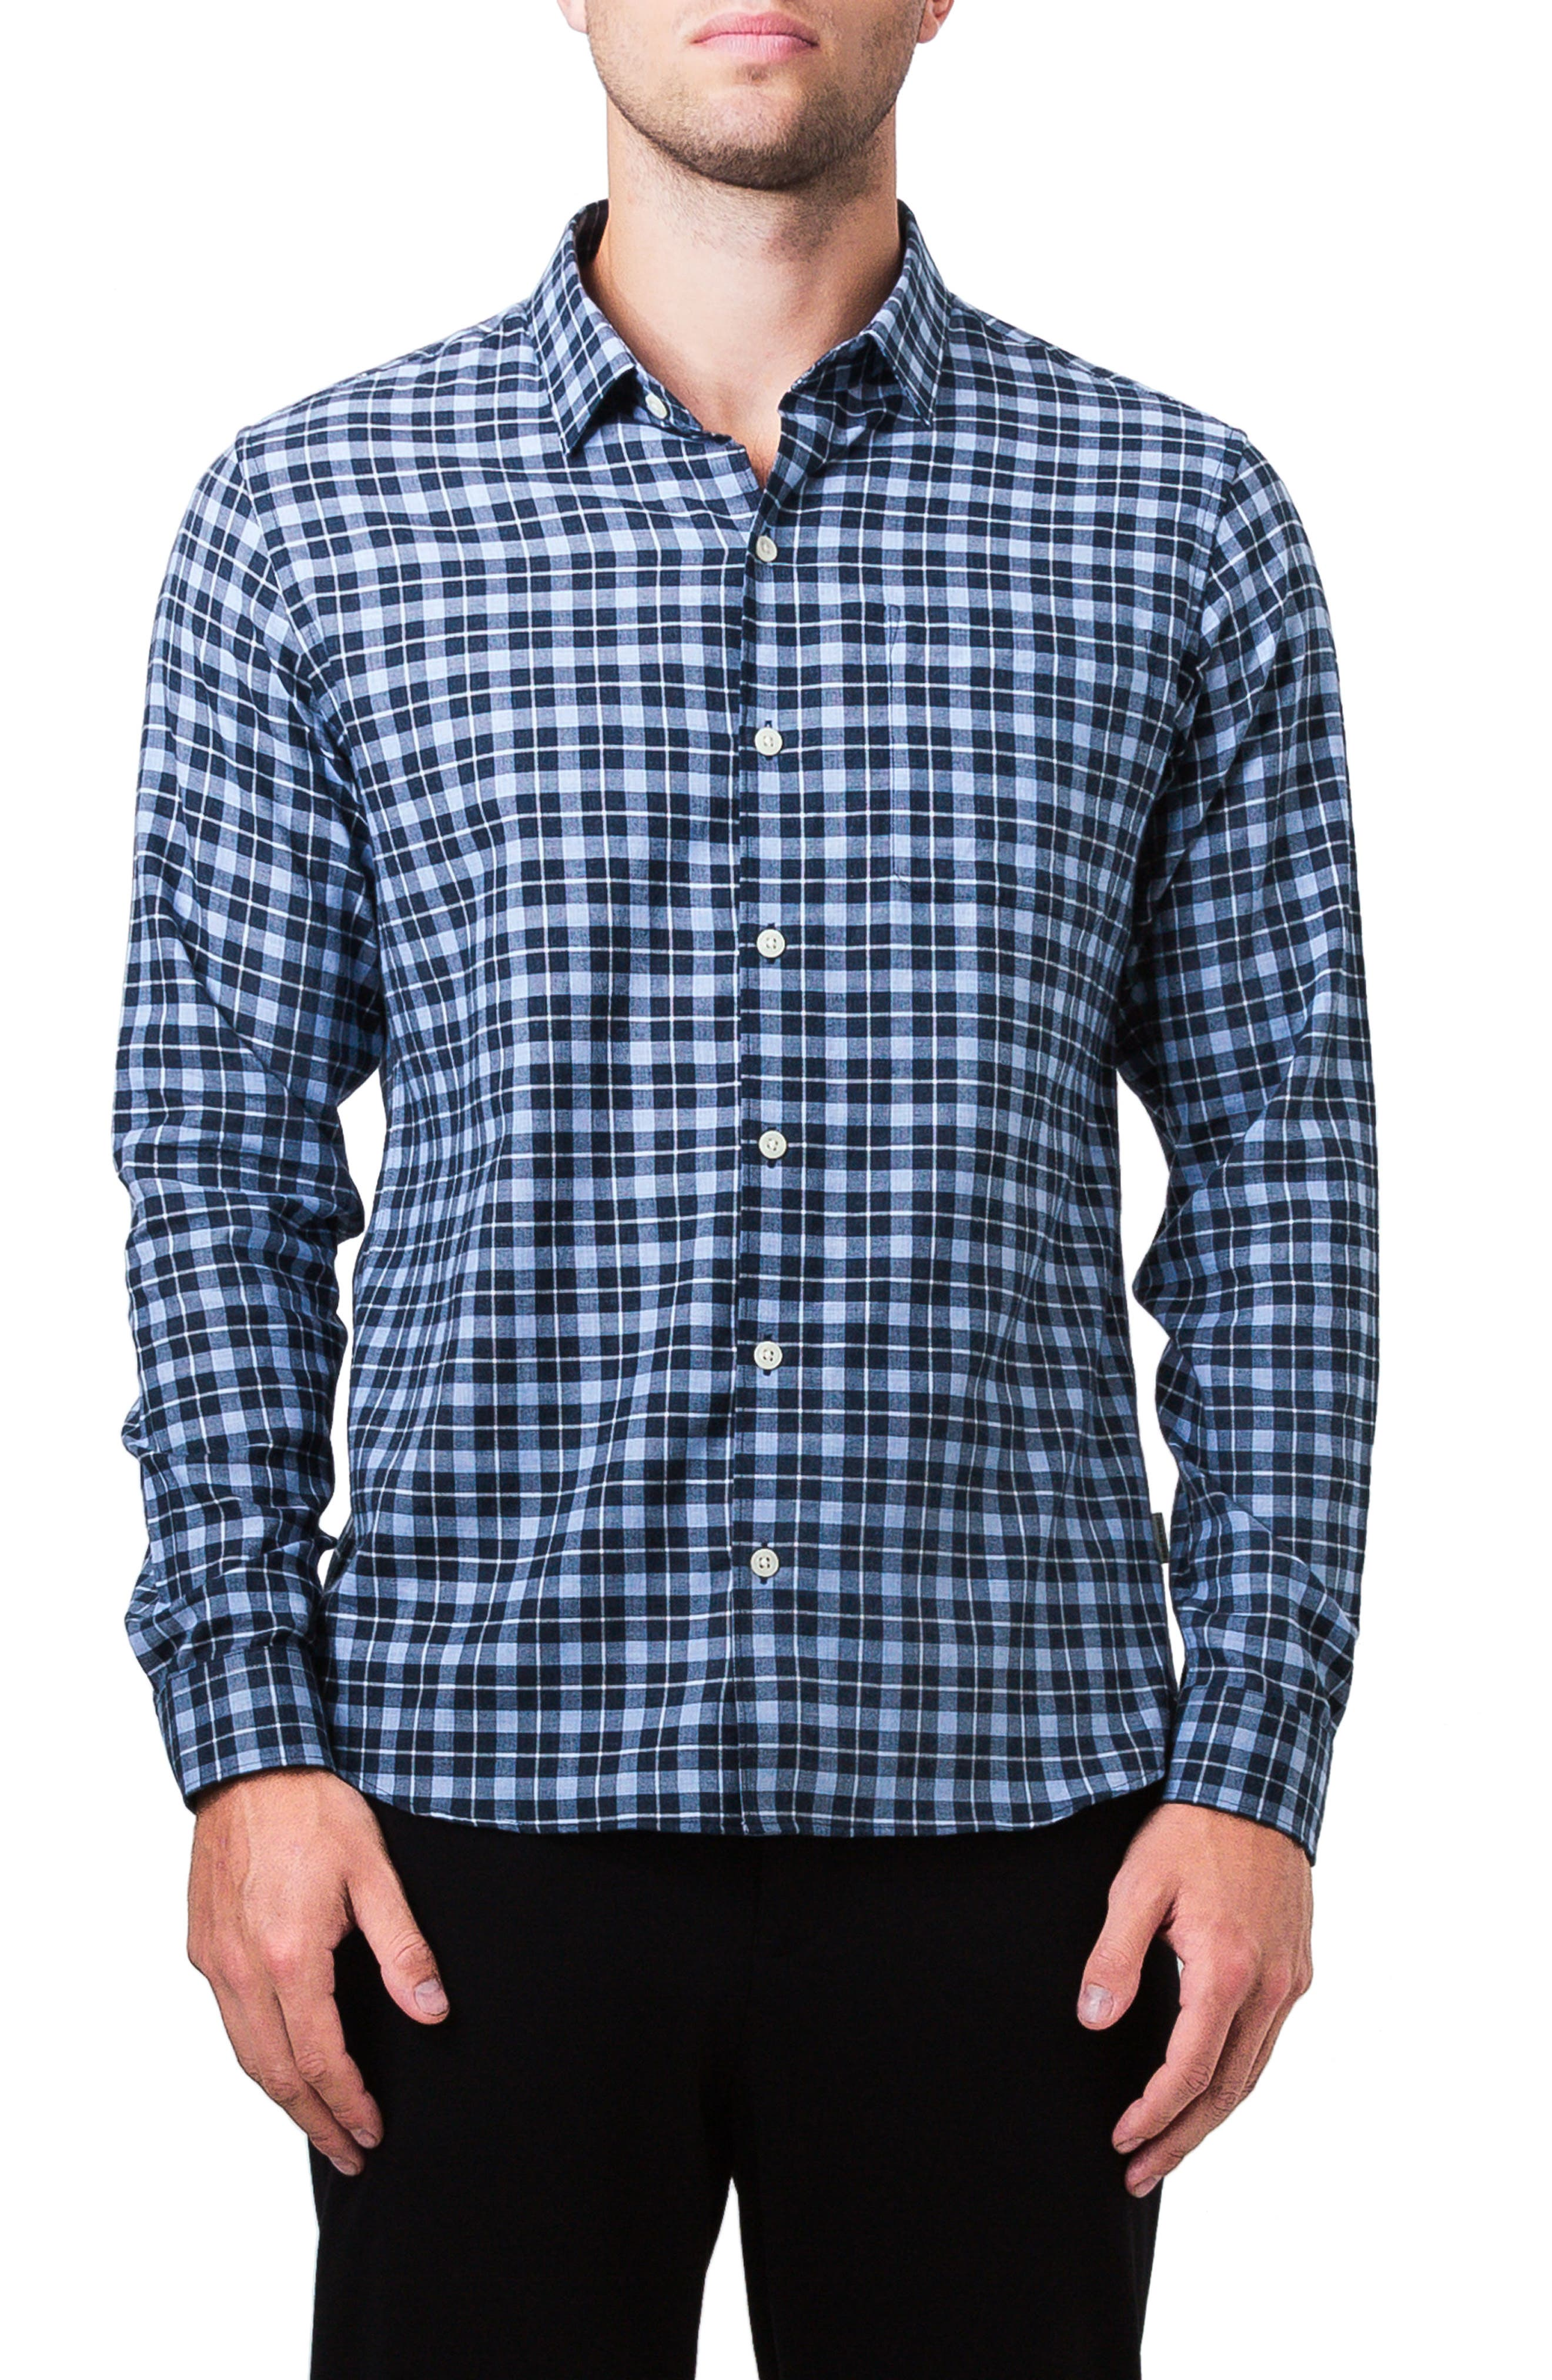 Sugar Storm Woven Shirt,                         Main,                         color, Powder Blue